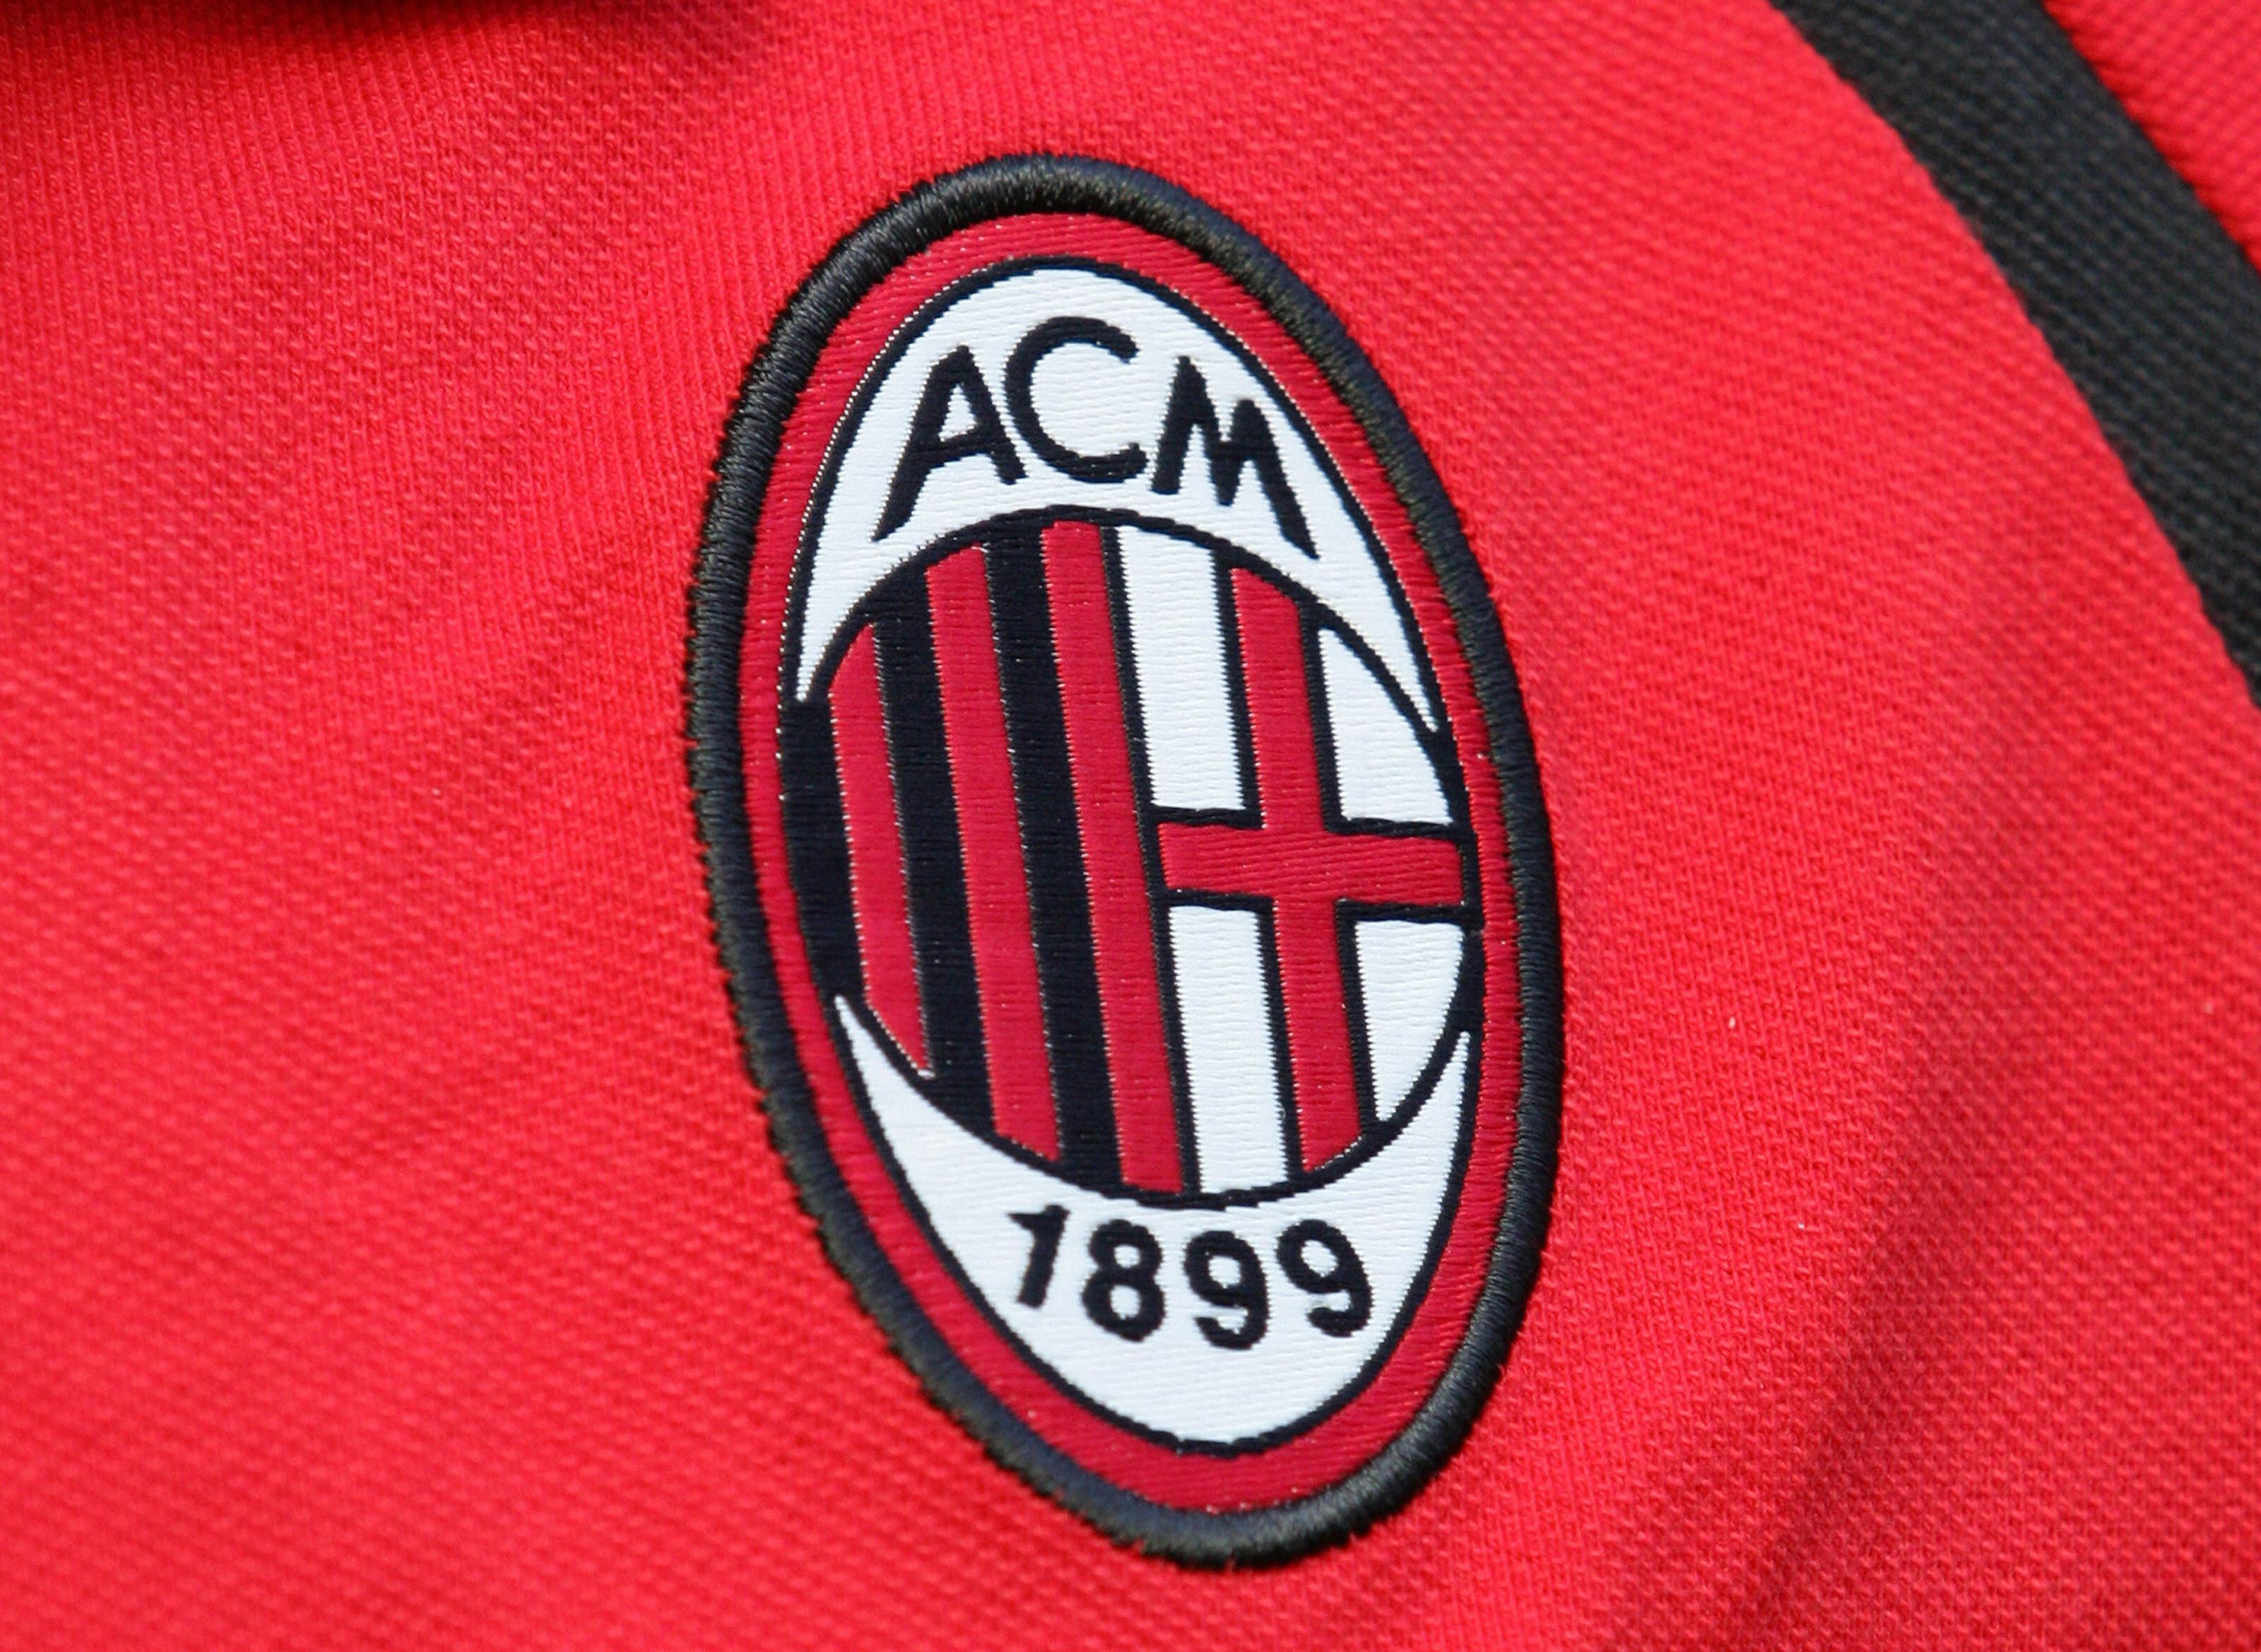 Picture taken 10 September 2006 in Milan shows the AC Milan logo before their Serie A football match AC Milan vs Lazio.